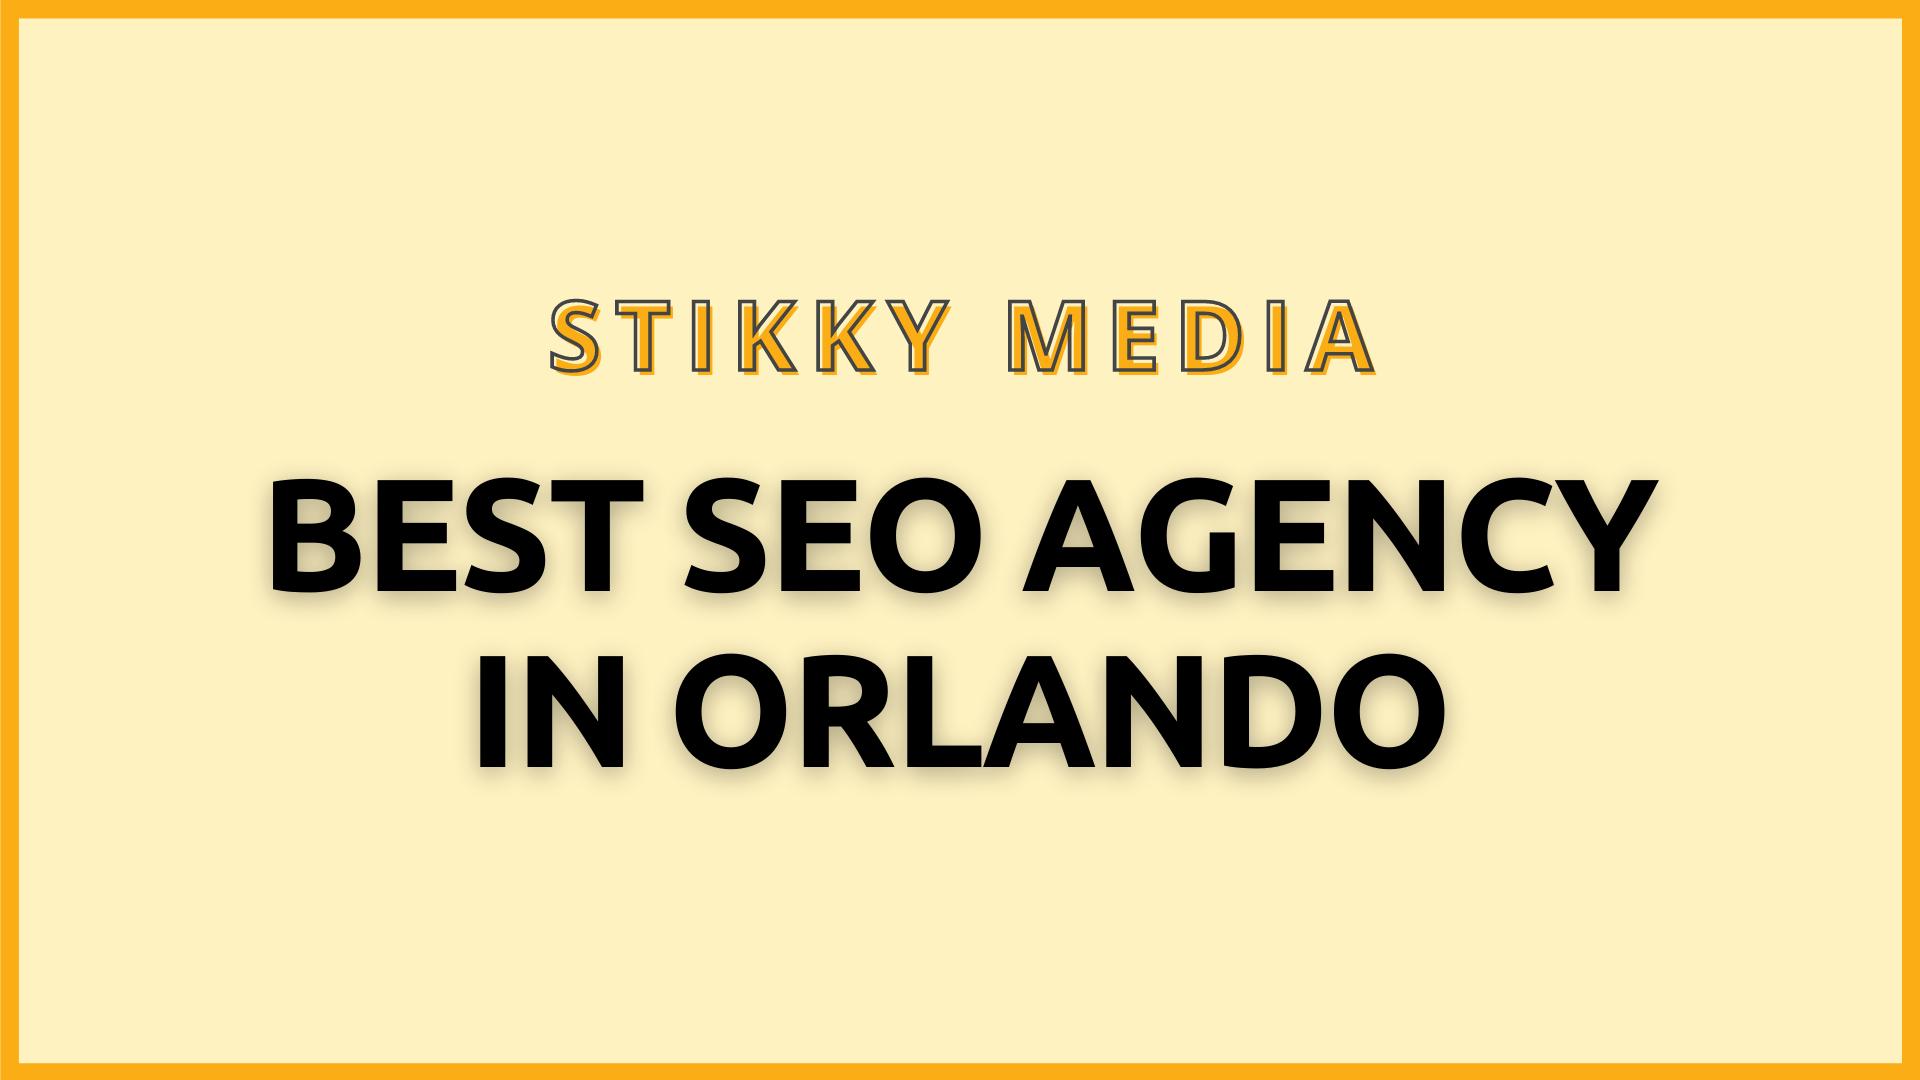 SEO services in Orlando - Stikky Media